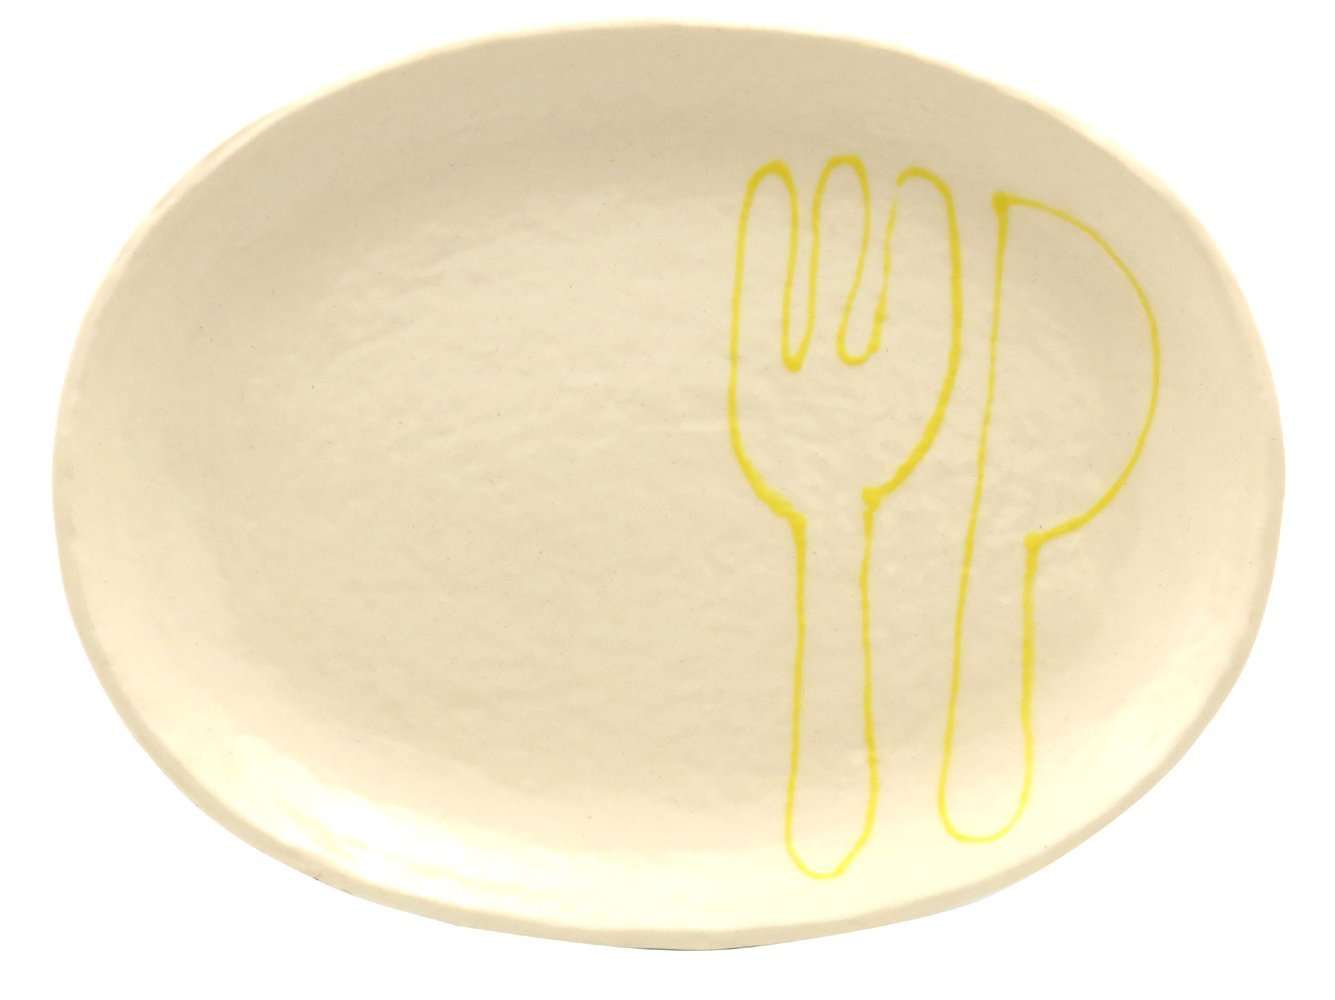 18cmの取り皿に使える楕円皿 3サイズの真ん中のお皿【楕円皿中(フォーク&ナイフイエロー)】